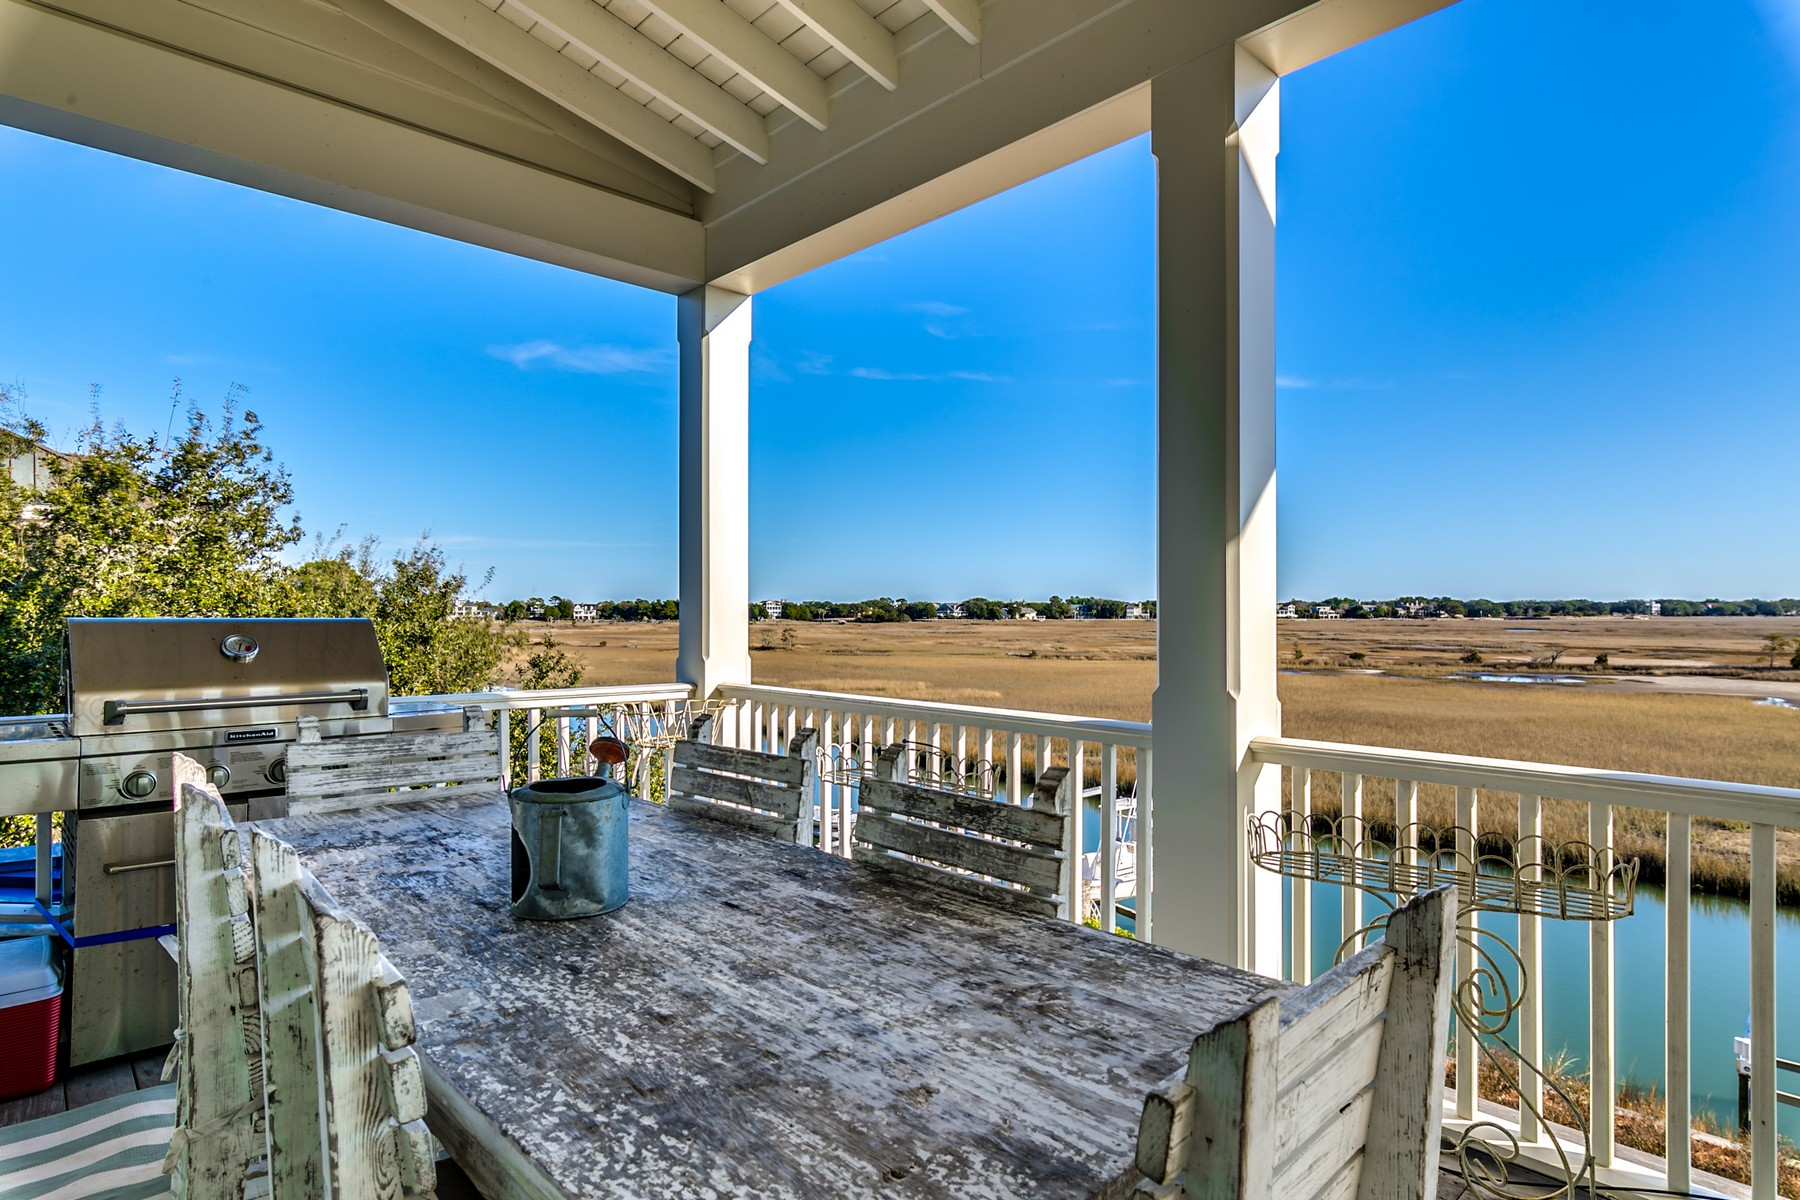 Additional photo for property listing at 3358 Luvan Blvd., Georgetown, SC 29440 3358  Luvan Blvd. 乔治城, 南卡罗来纳州 29440 美国